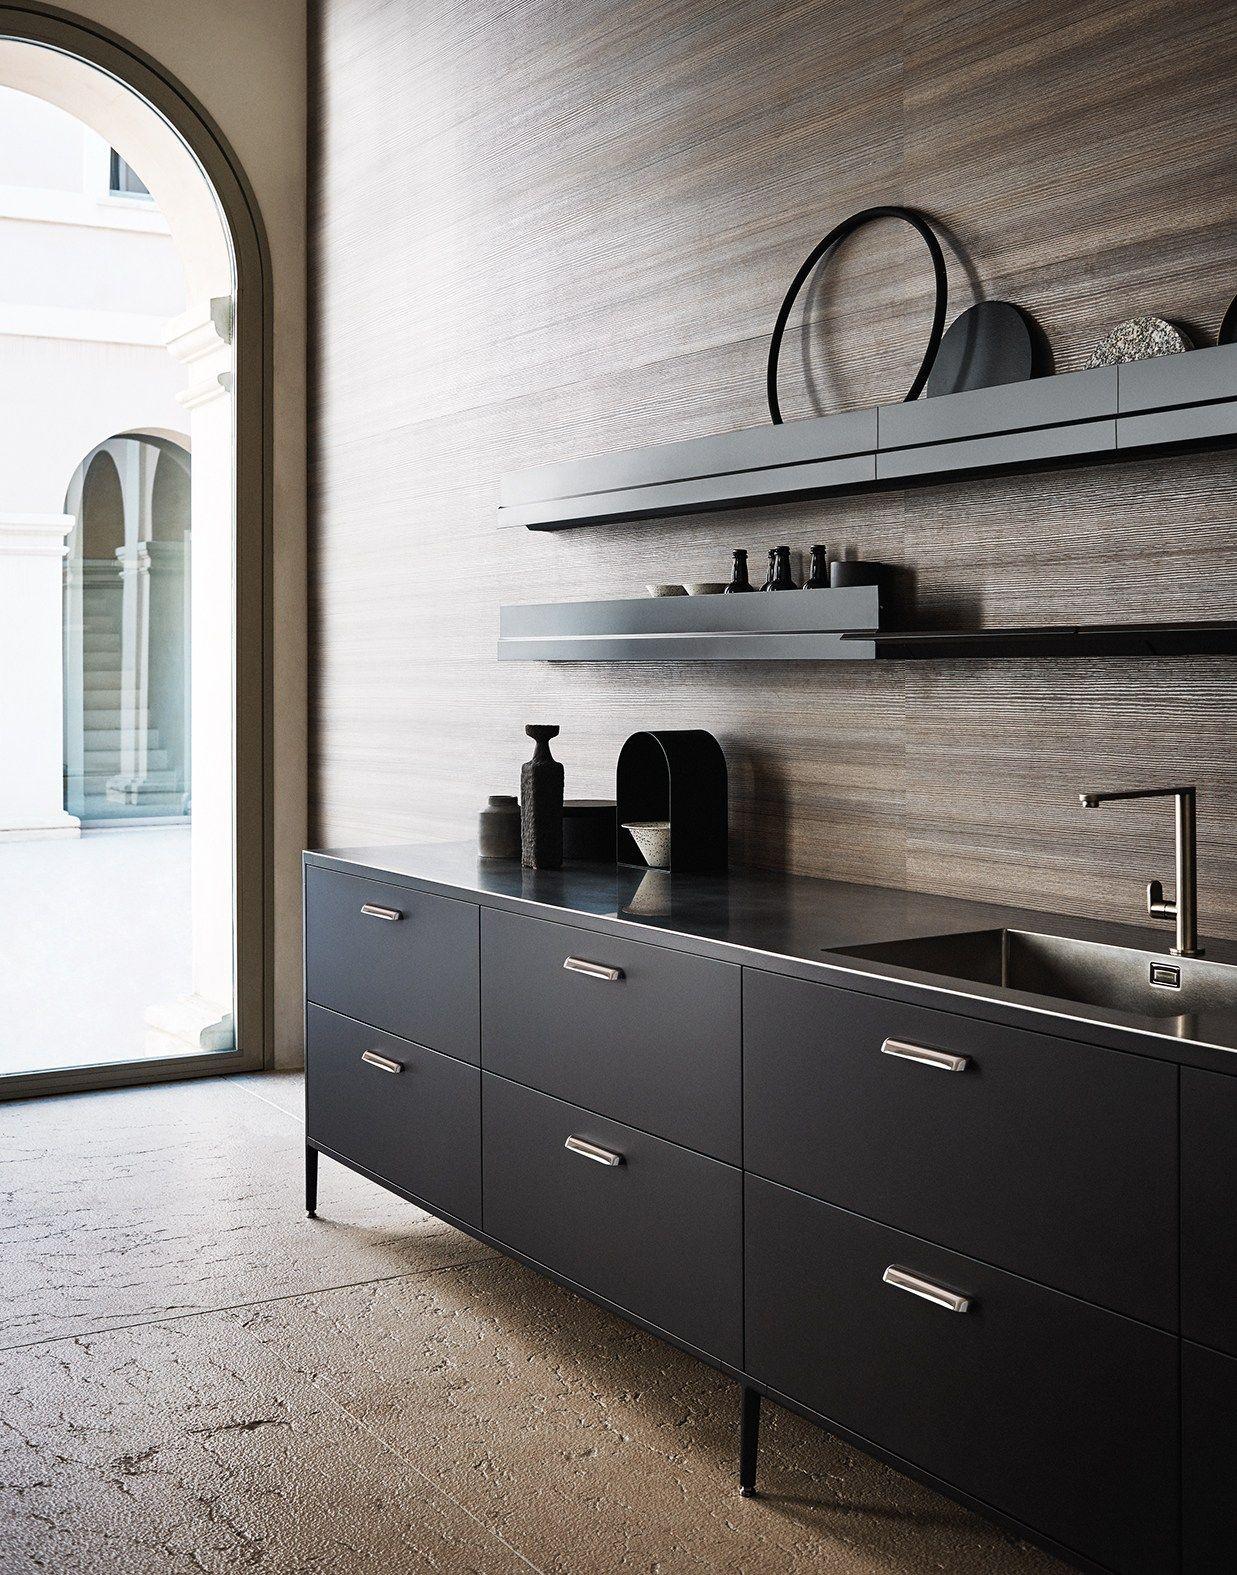 Modular kitchen with island UNIT - COMPOSITION 3 by Cesar Arredamenti design García Cumini Associati